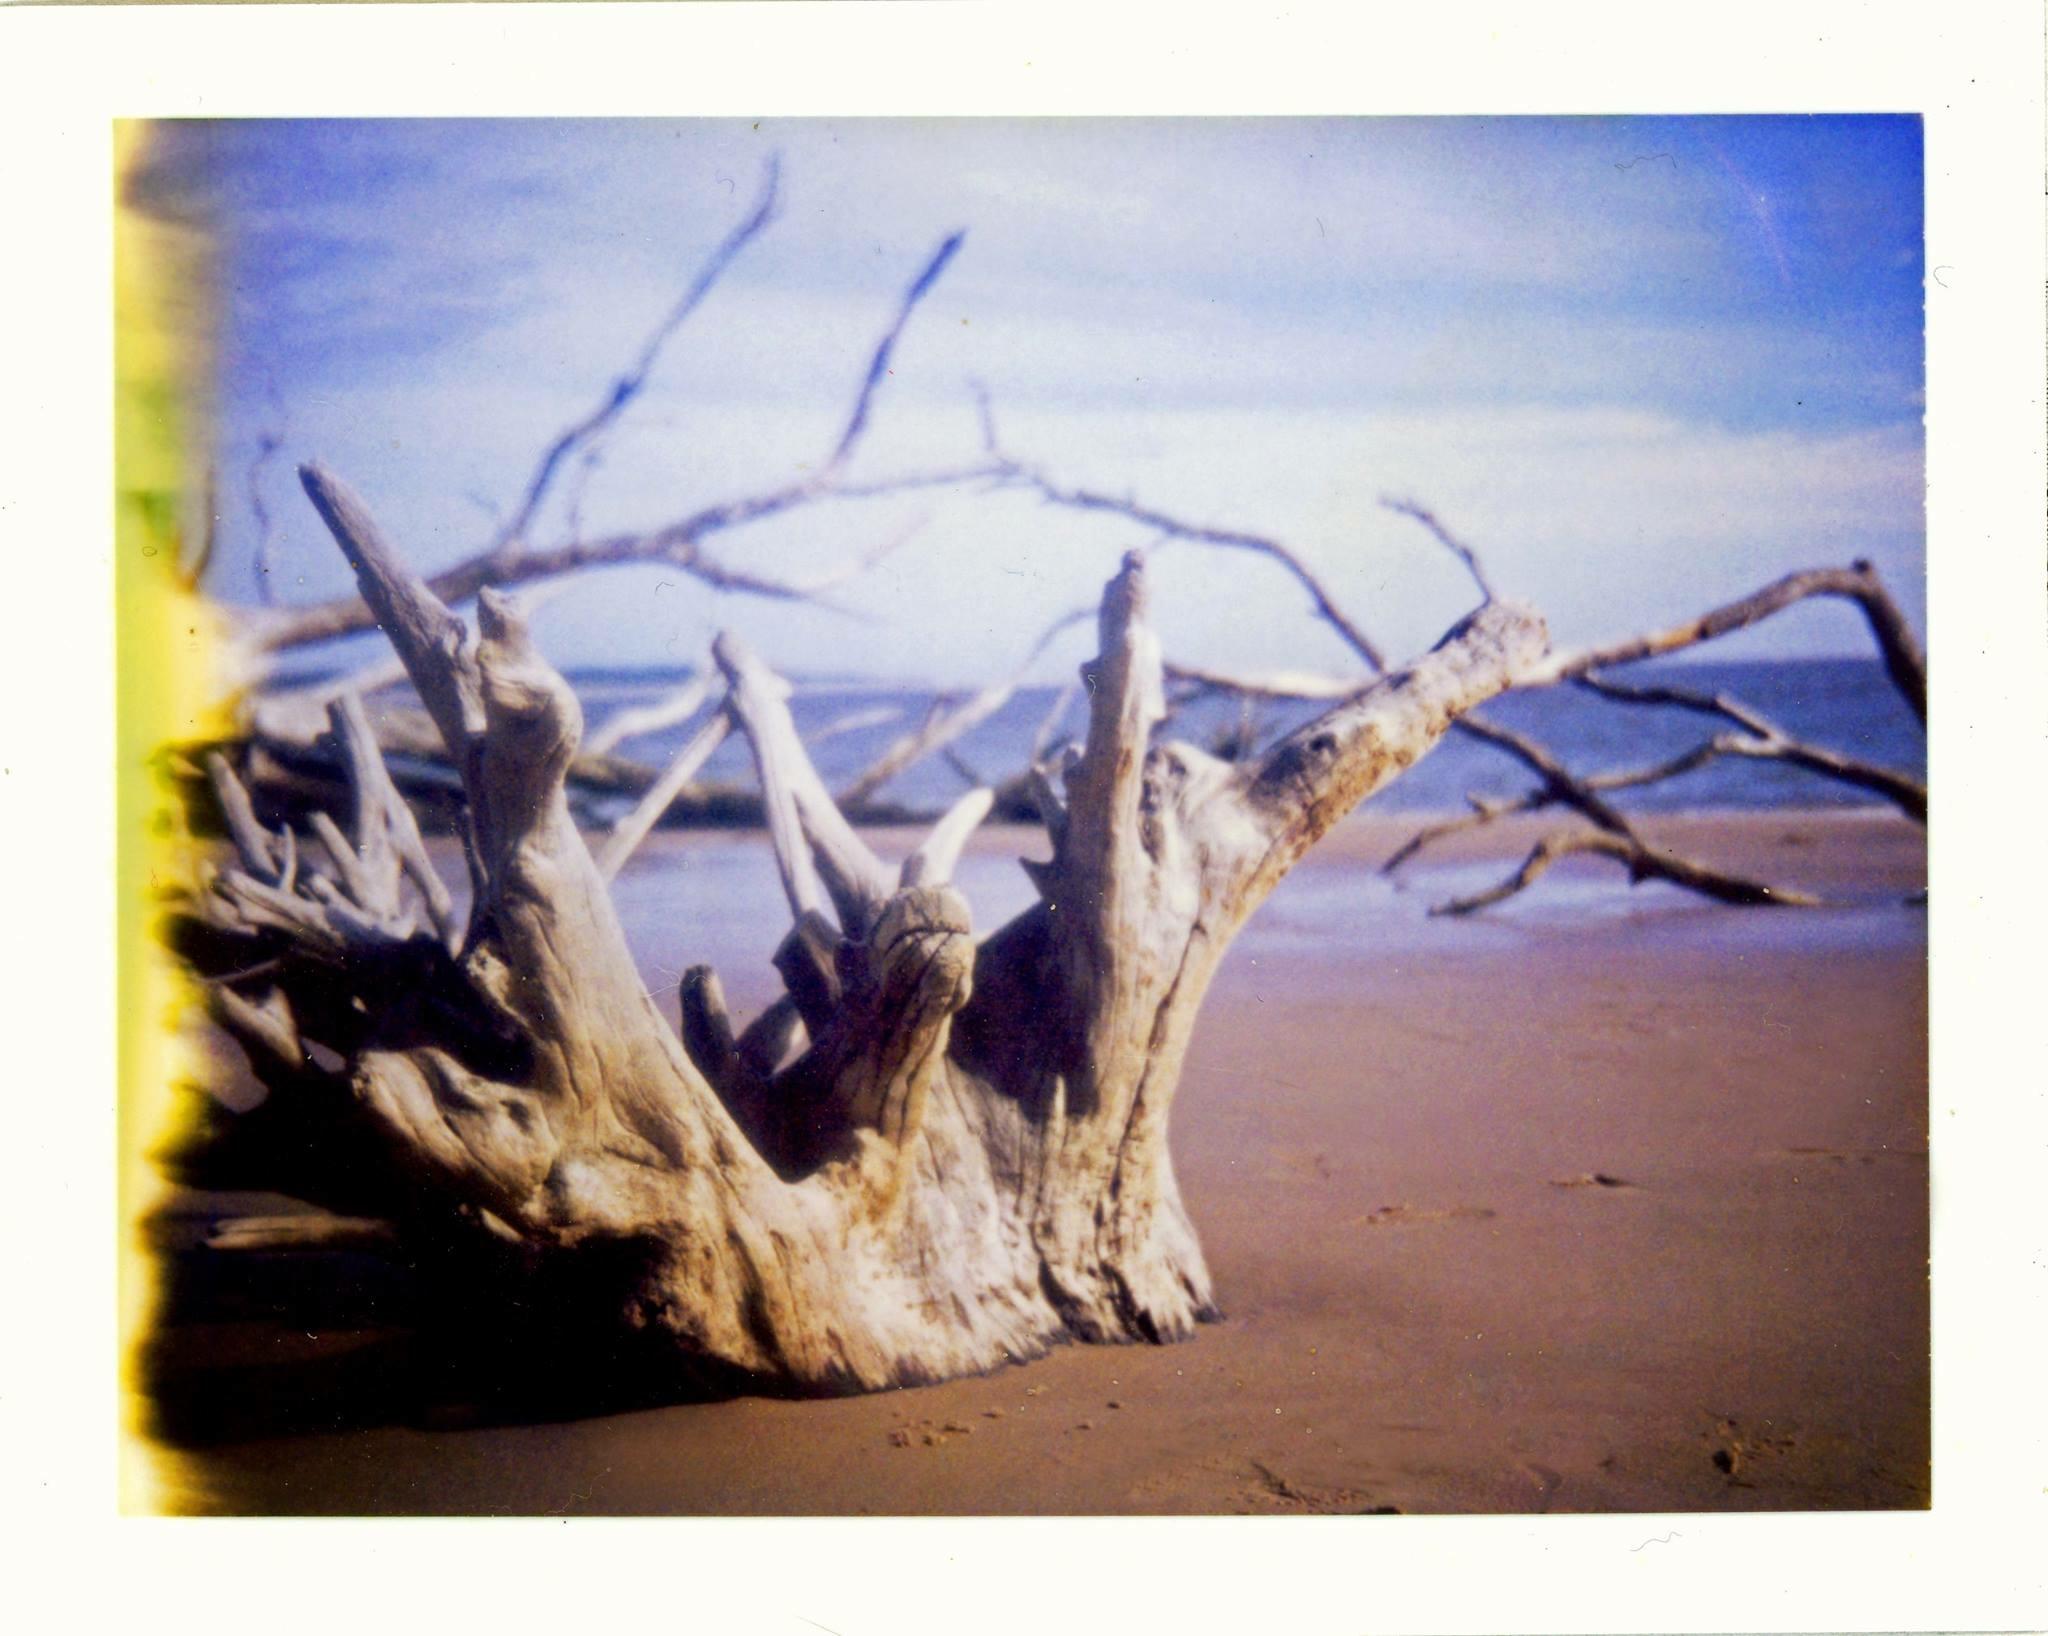 Crown of The Sea | Polaroid Color Pack 3 | Polaroid 690 Film | Aimee Lower